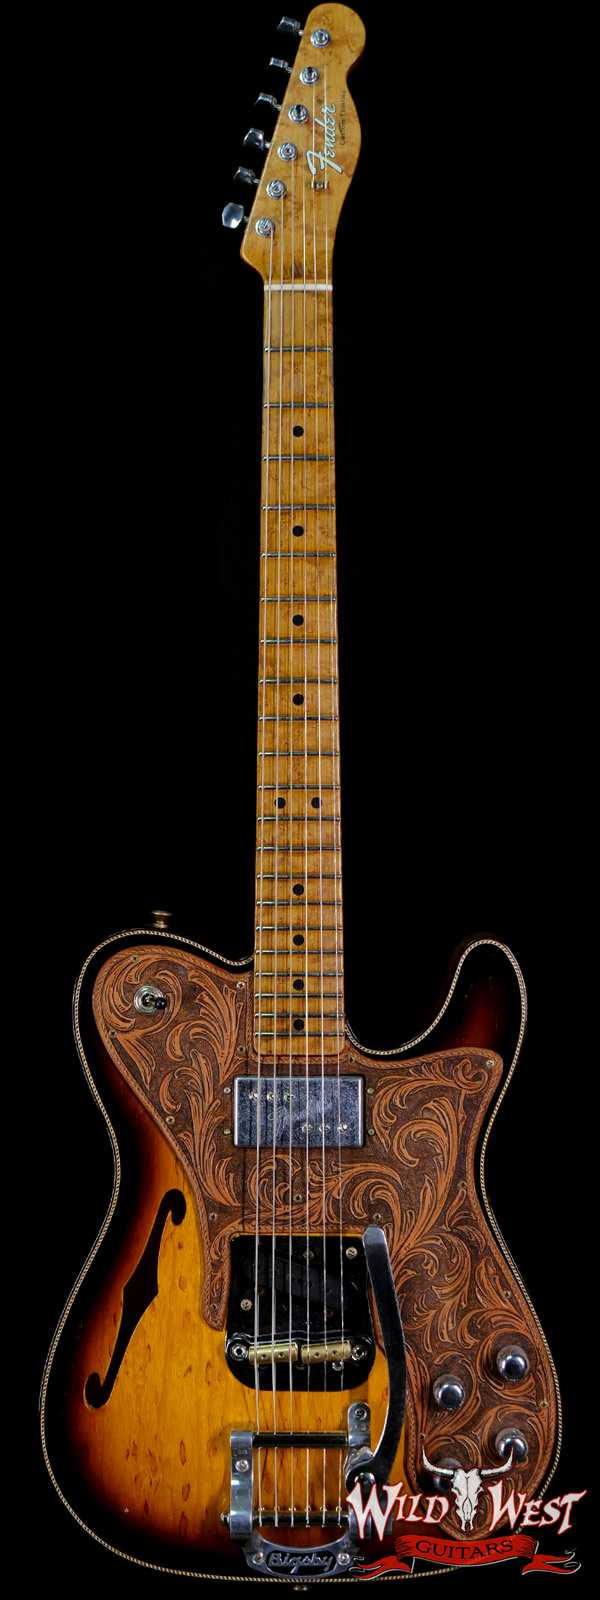 Fender Custom Shop Ron Thorn Masterbuilt 72 Telecaster Custom Thinline Bigsby Leather Tooled Pickguard by Beth Freeman Journeyman Relic 3 Tone Sunburst